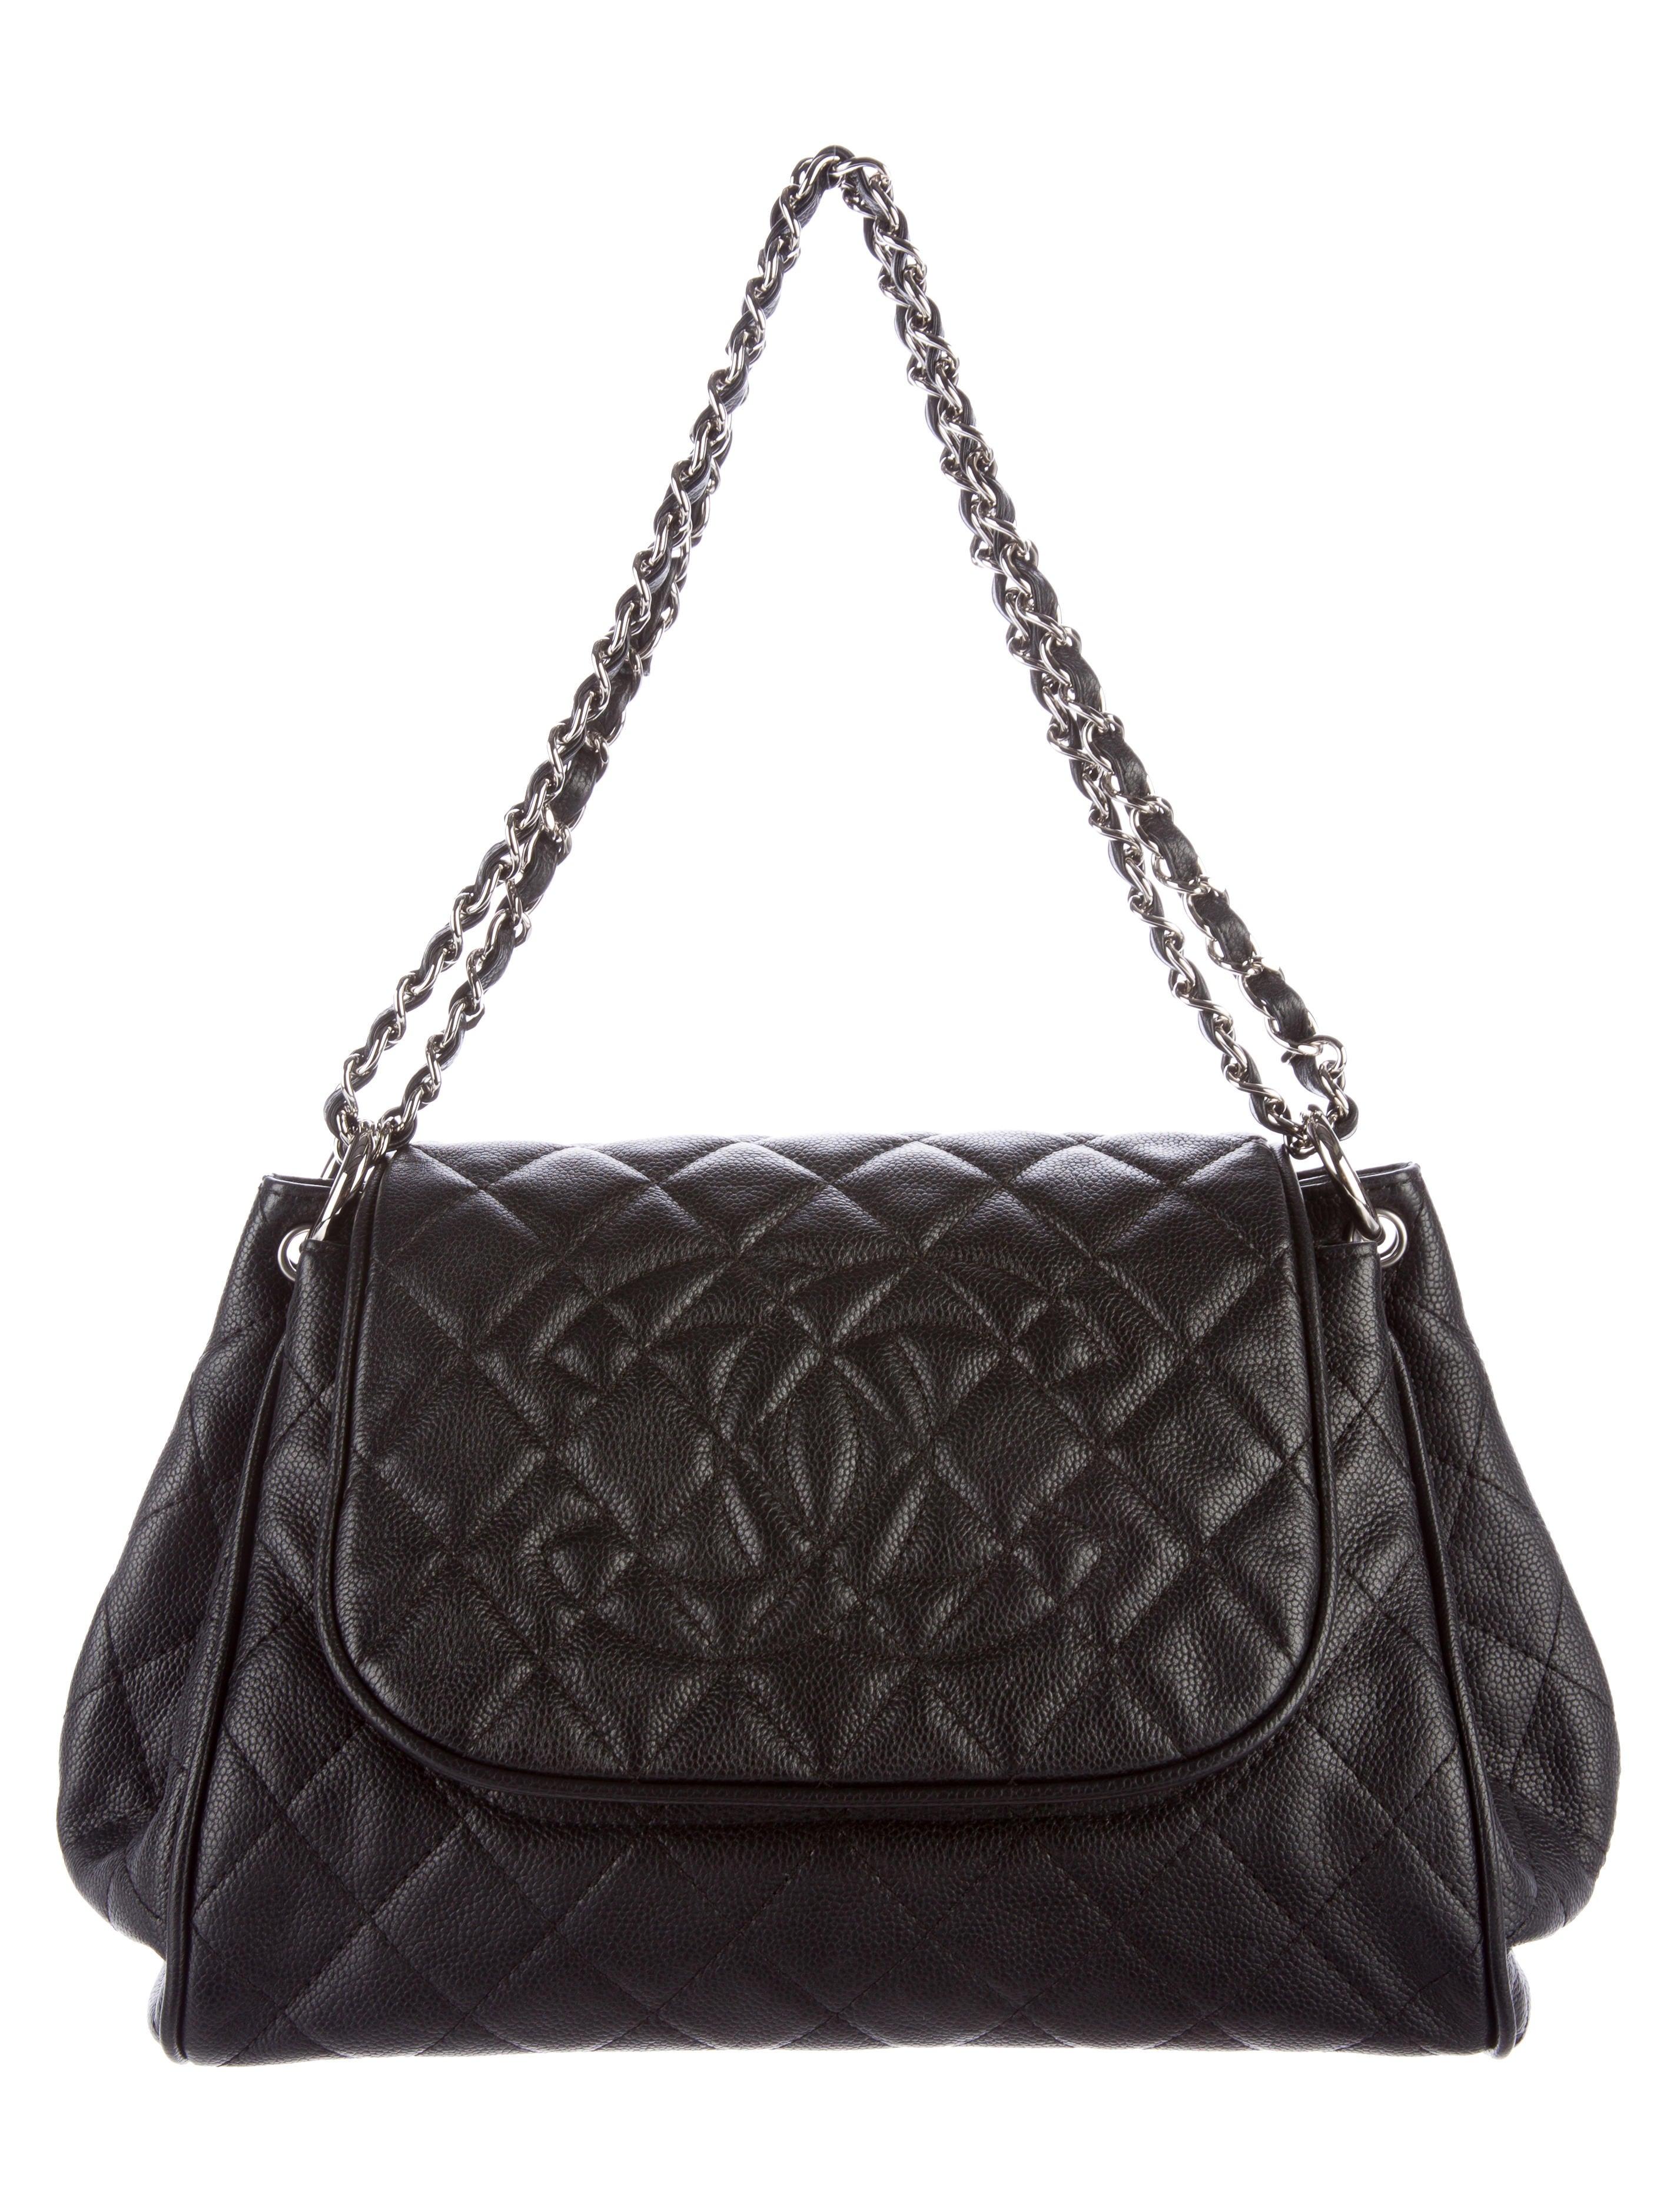 Chanel Timeless Accordion Flap Bag - Handbags